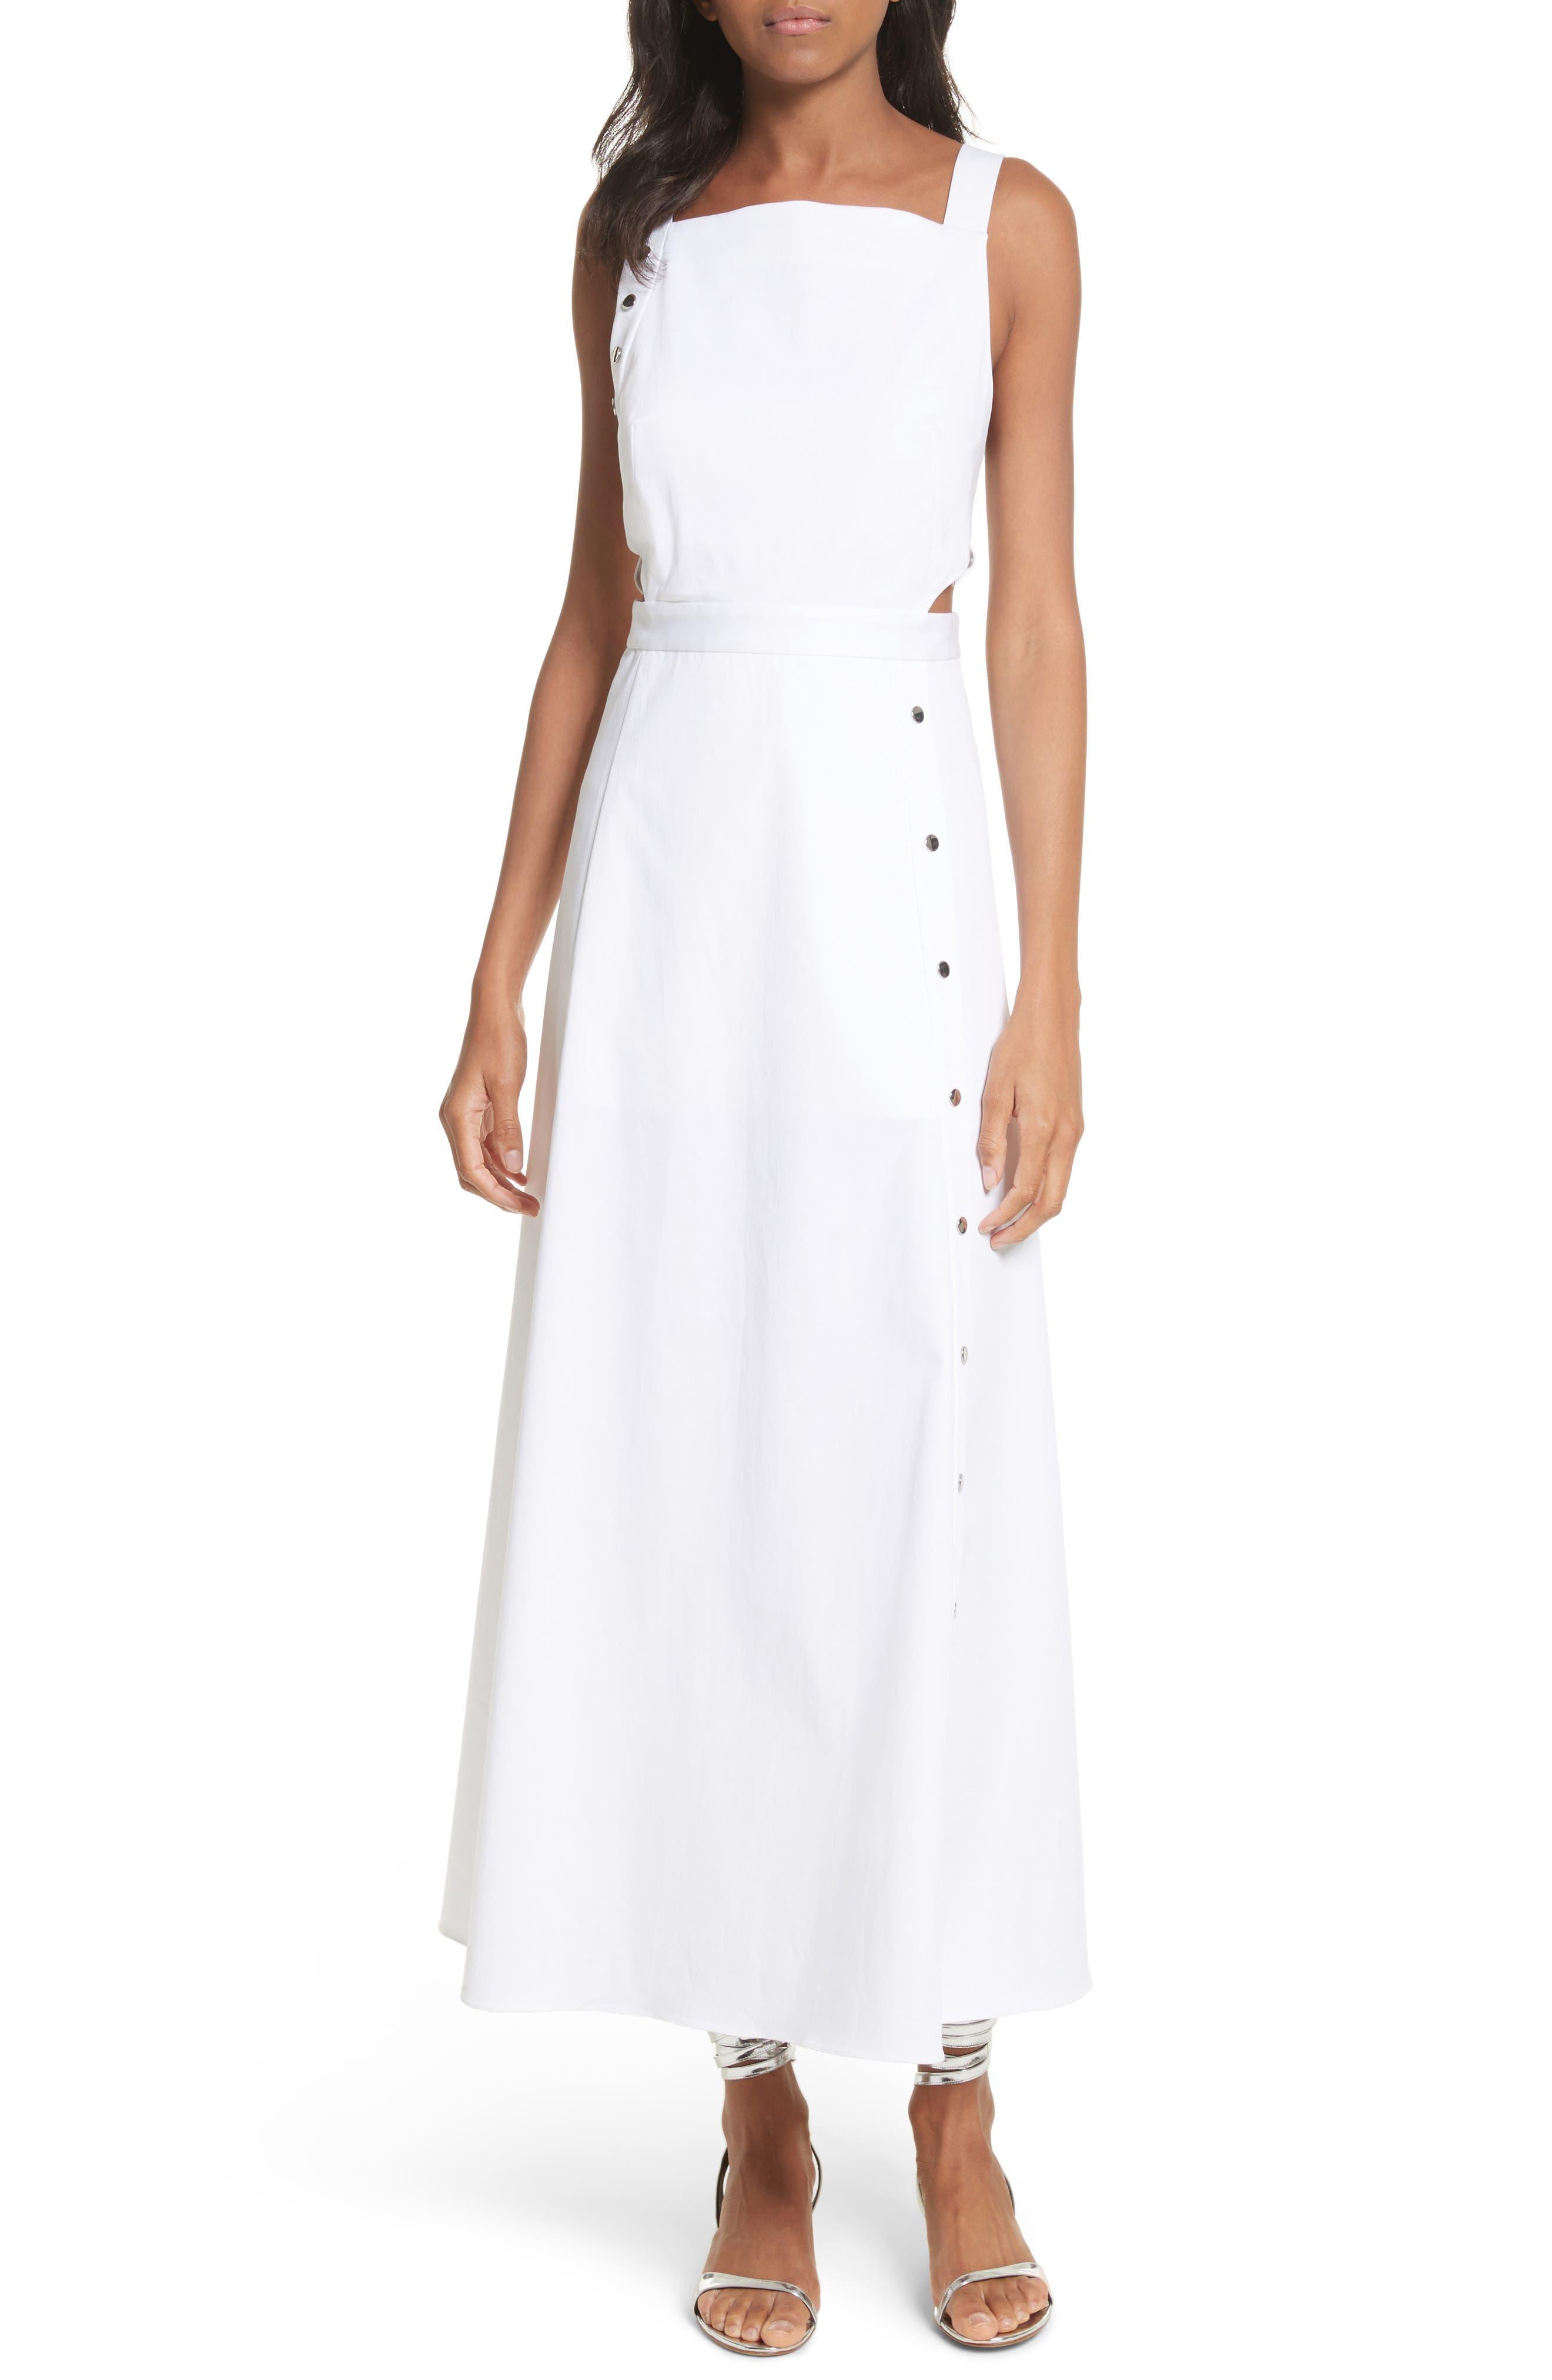 Tibi Crosby Snap Strappy Dress